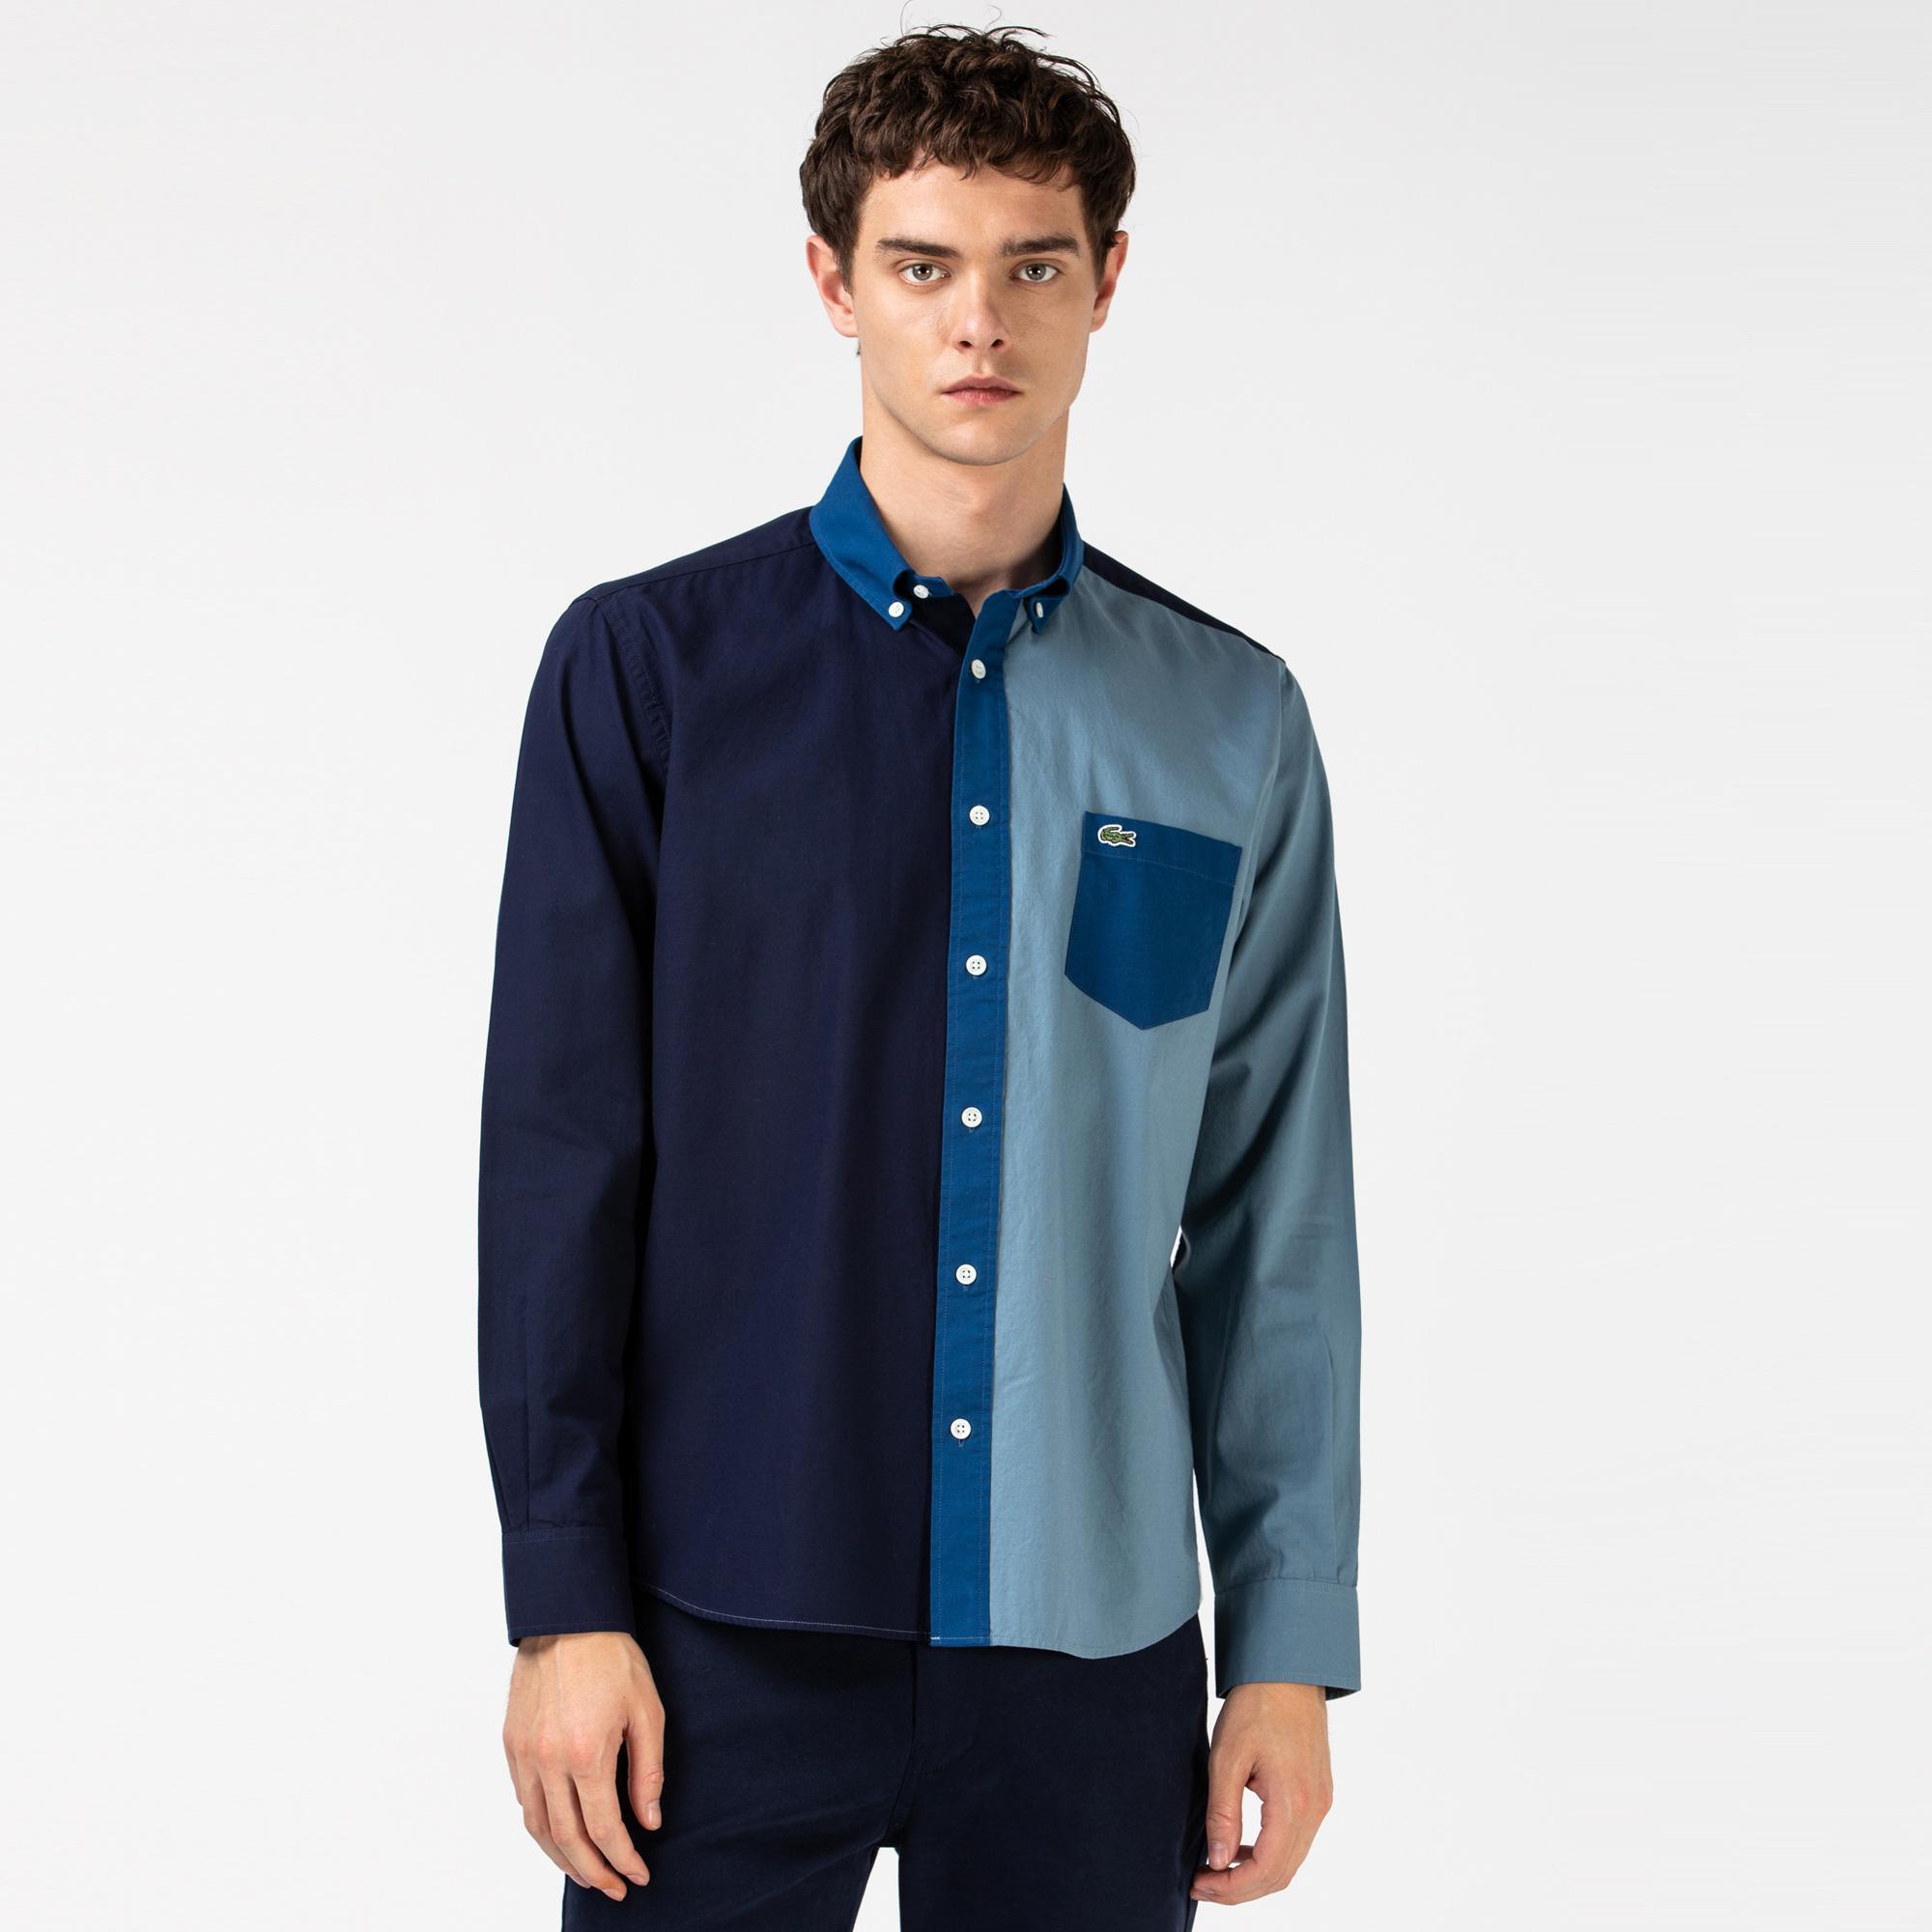 Lacoste Erkek Relax Fit Blok Desenli Mavi Gömlek